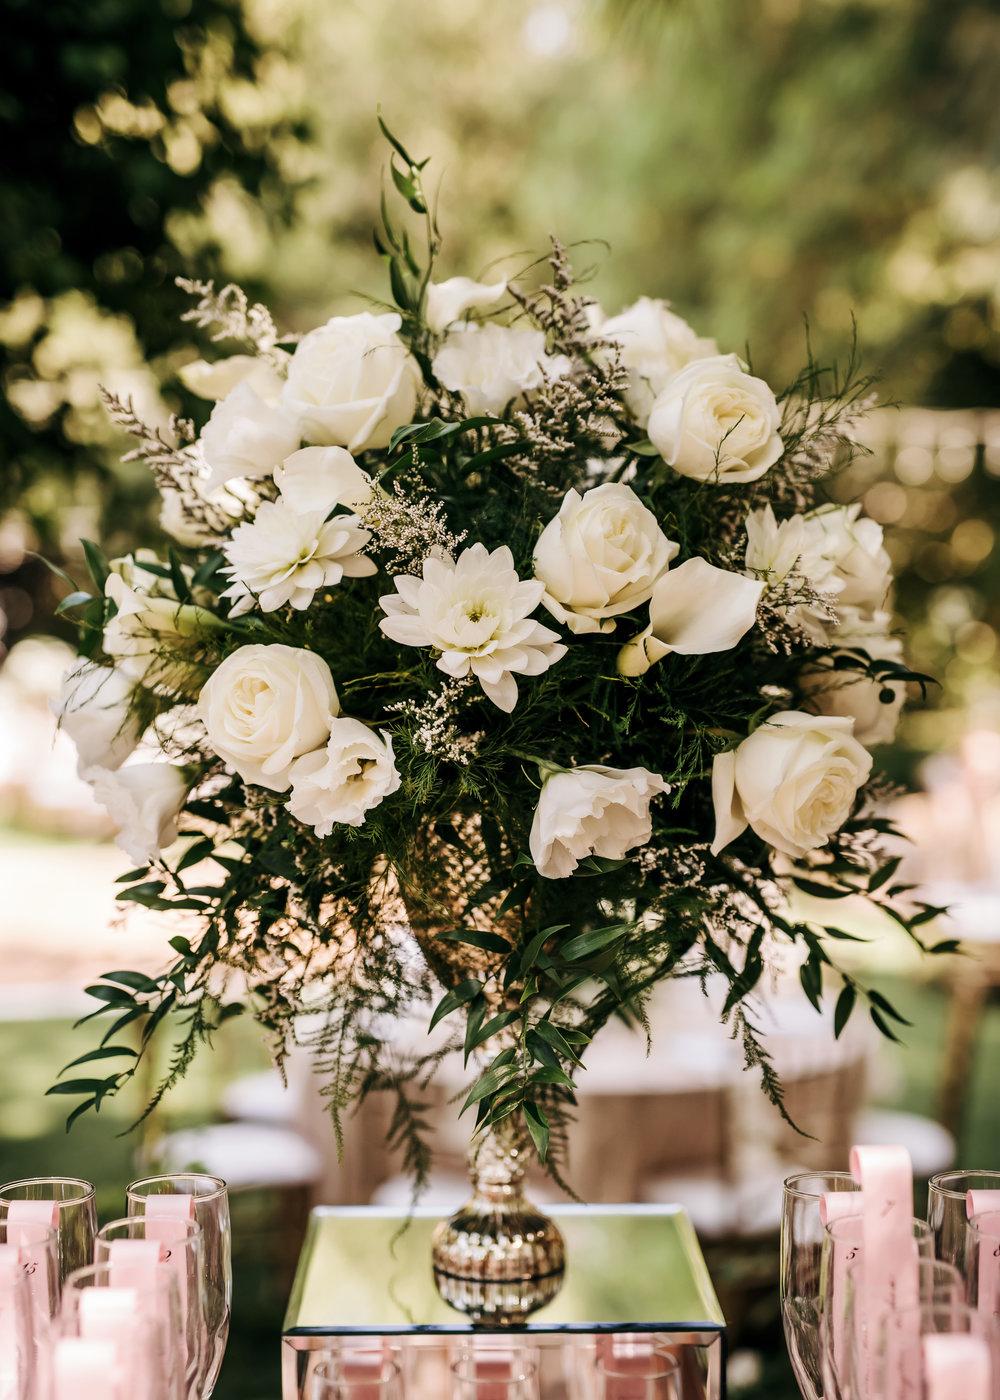 Turchin_20180825_Austinae-Brent-Wedding_387.jpg